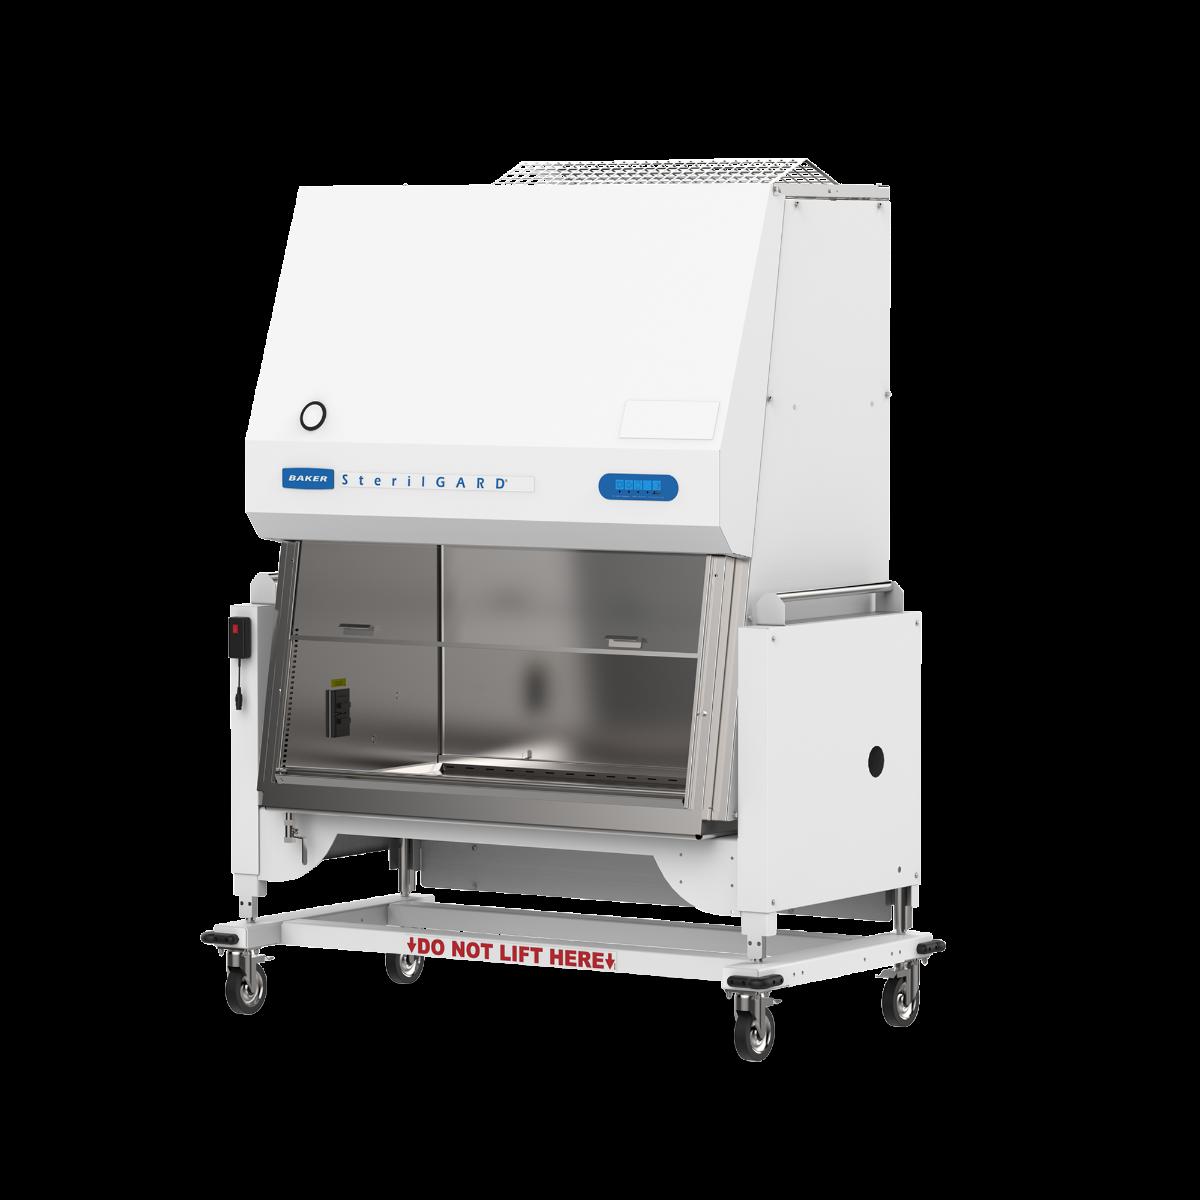 SterilGARD® Animal Transfer Station Class II Type A2 Biosafety Cabinet